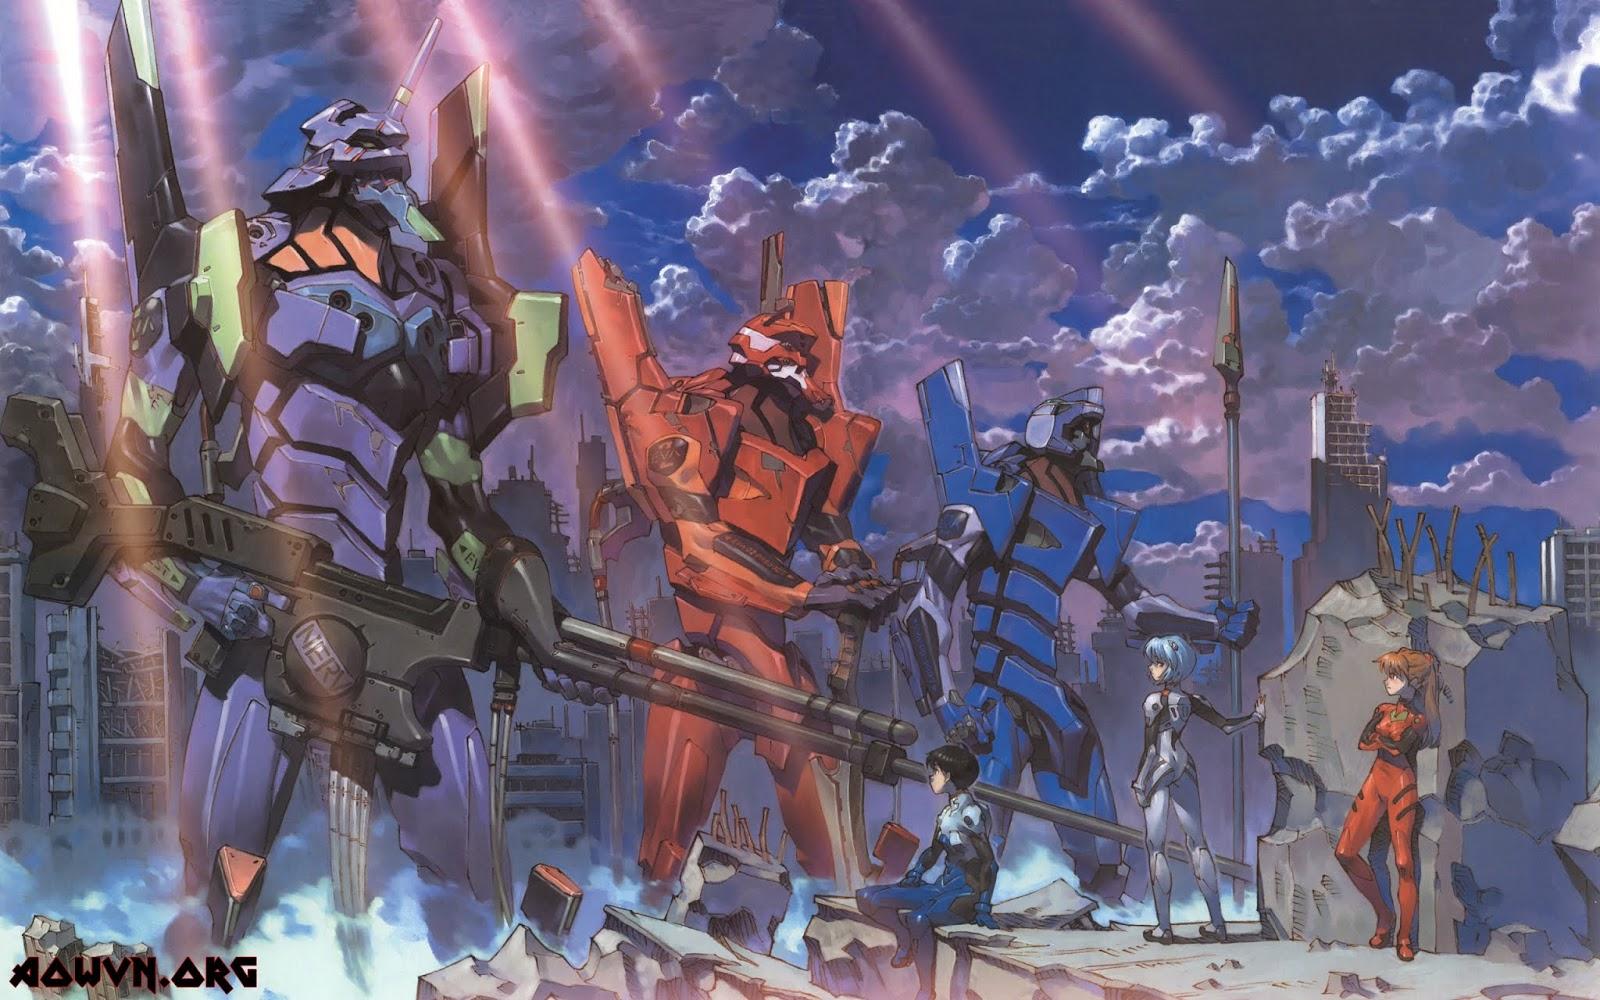 rabstol net evangelion 02 - [Anime 3gp Mp4 ] Neon Genesis Evangelion TV + 5 Movie + Movie Parody + Special BD | Vietsub - Mecha huyền thoại - Kịch tích - Max hay!!